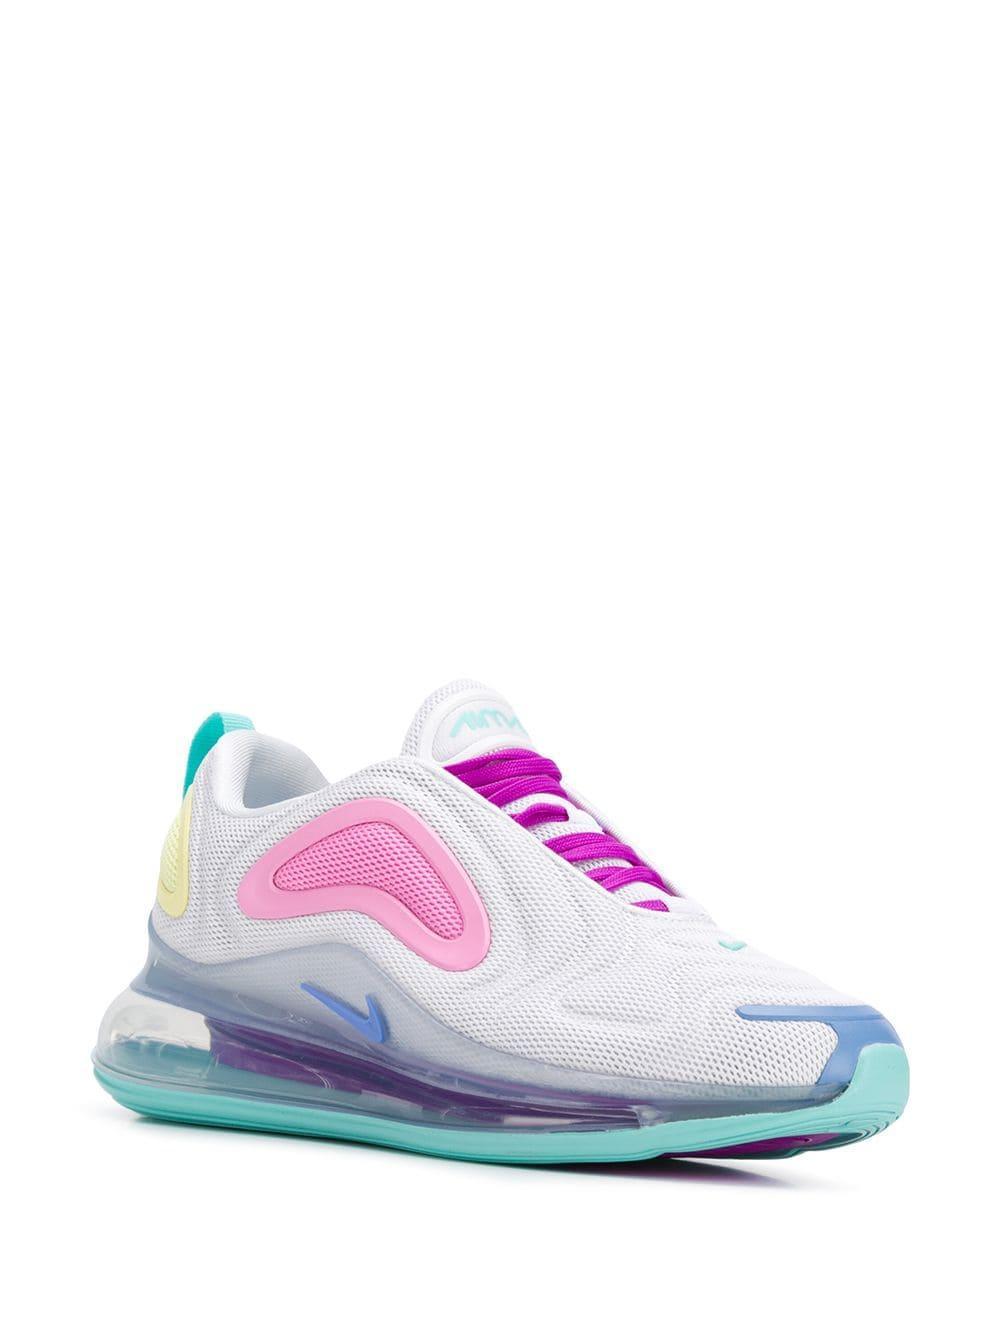 nike pastel shoes